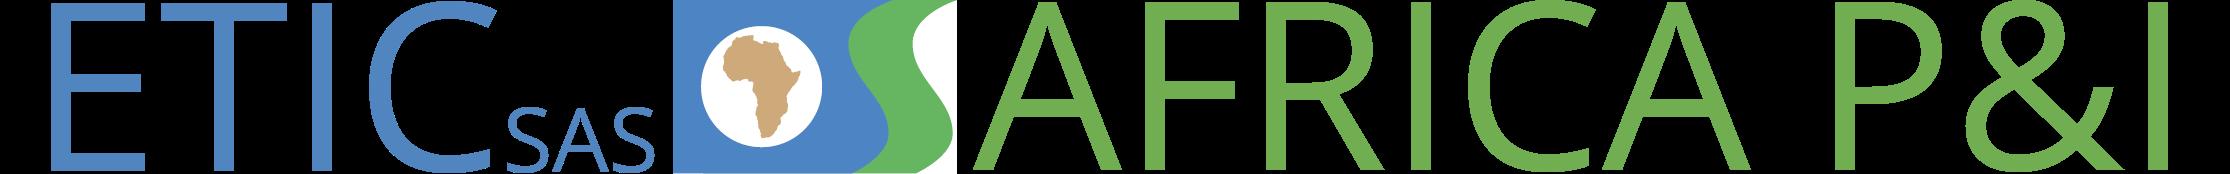 logo Etic Africa pandi